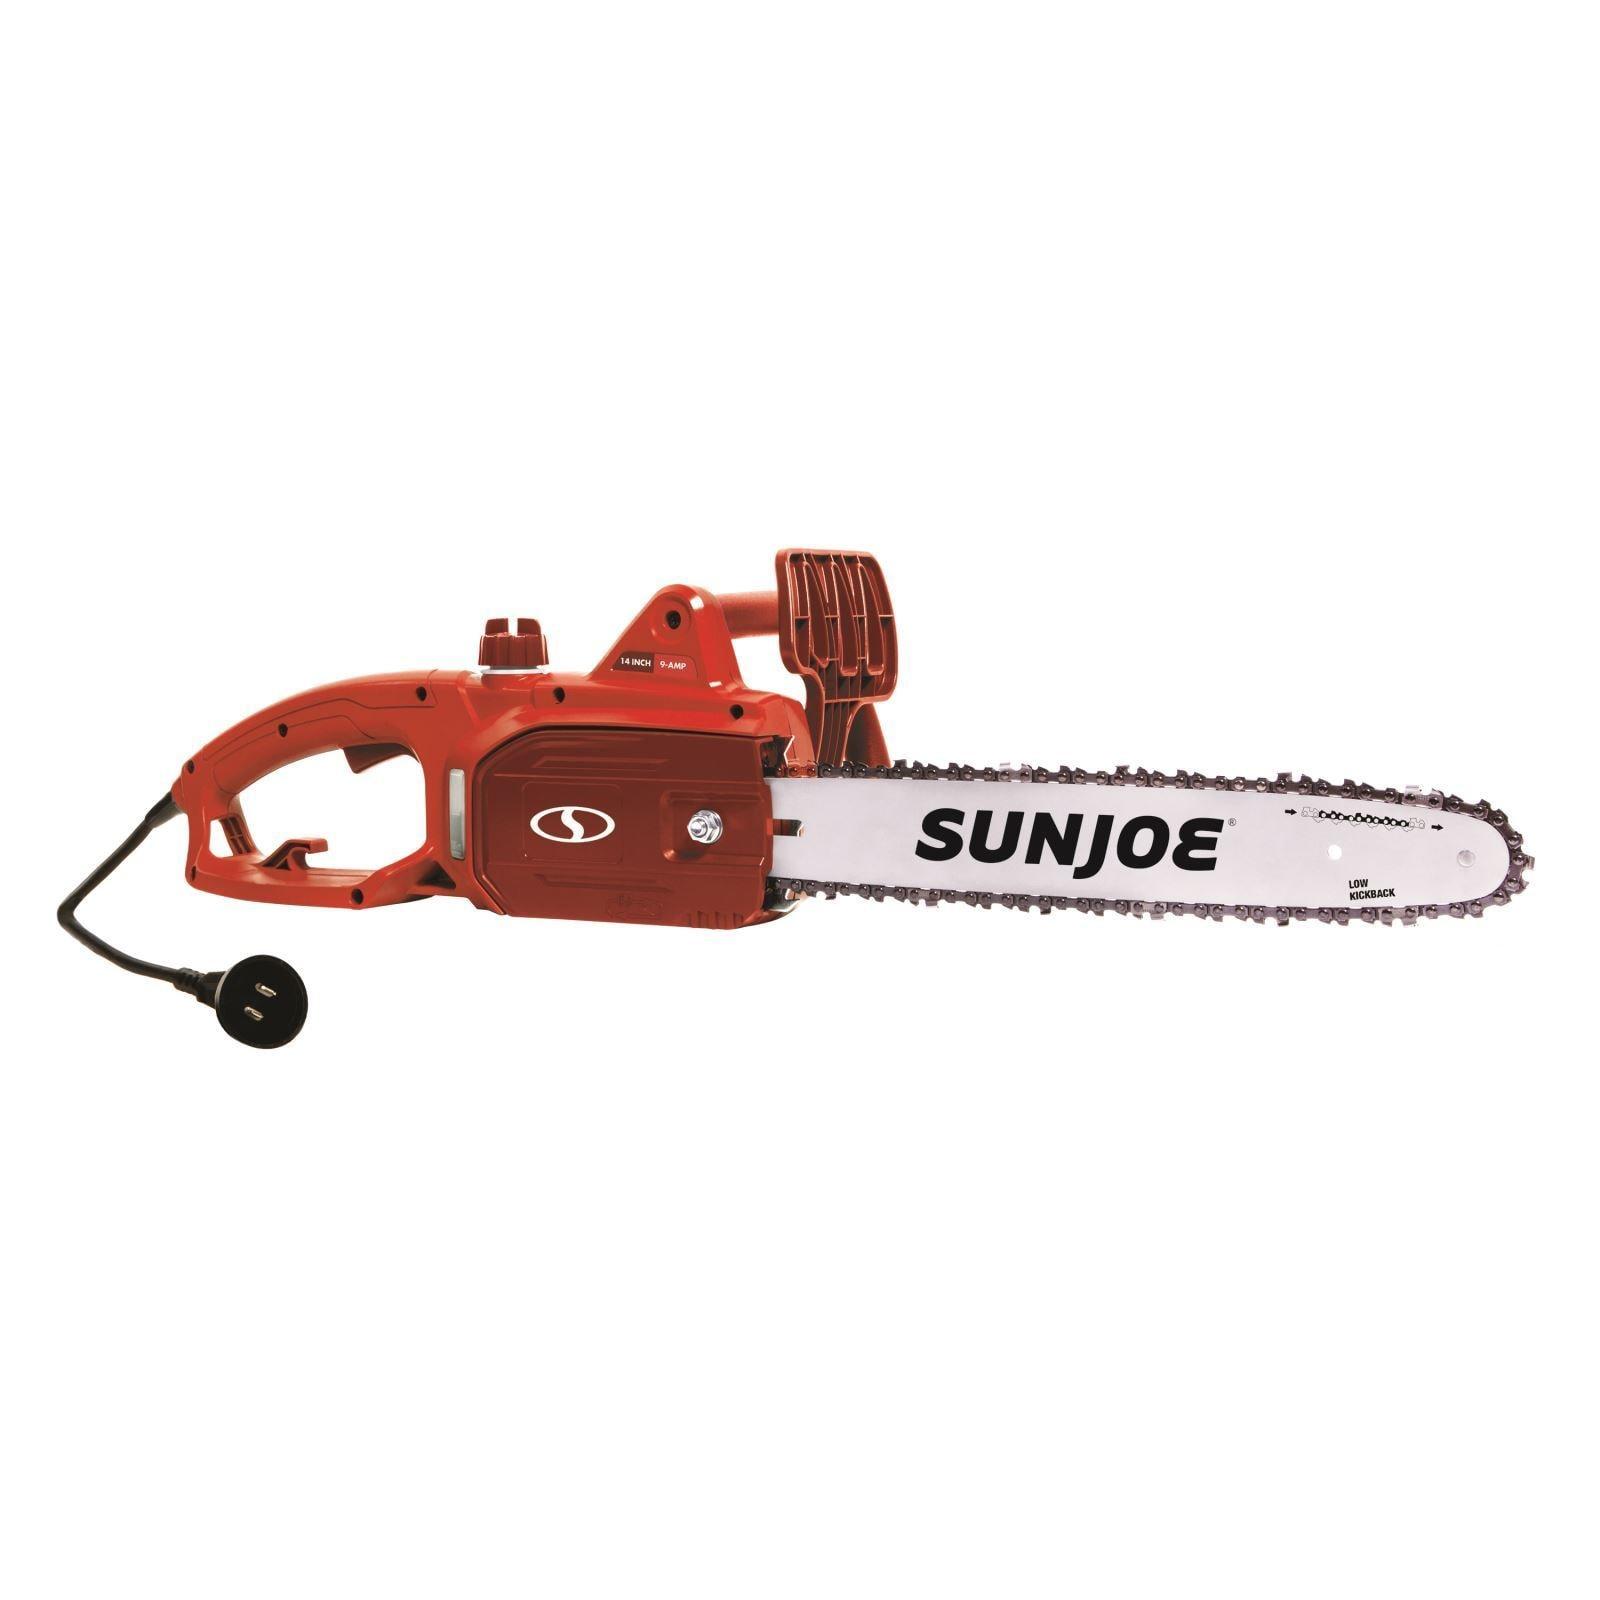 Sun Joe 14-Inch 9-Amp Electric Chain Saw (Red) (Red) (Pla...